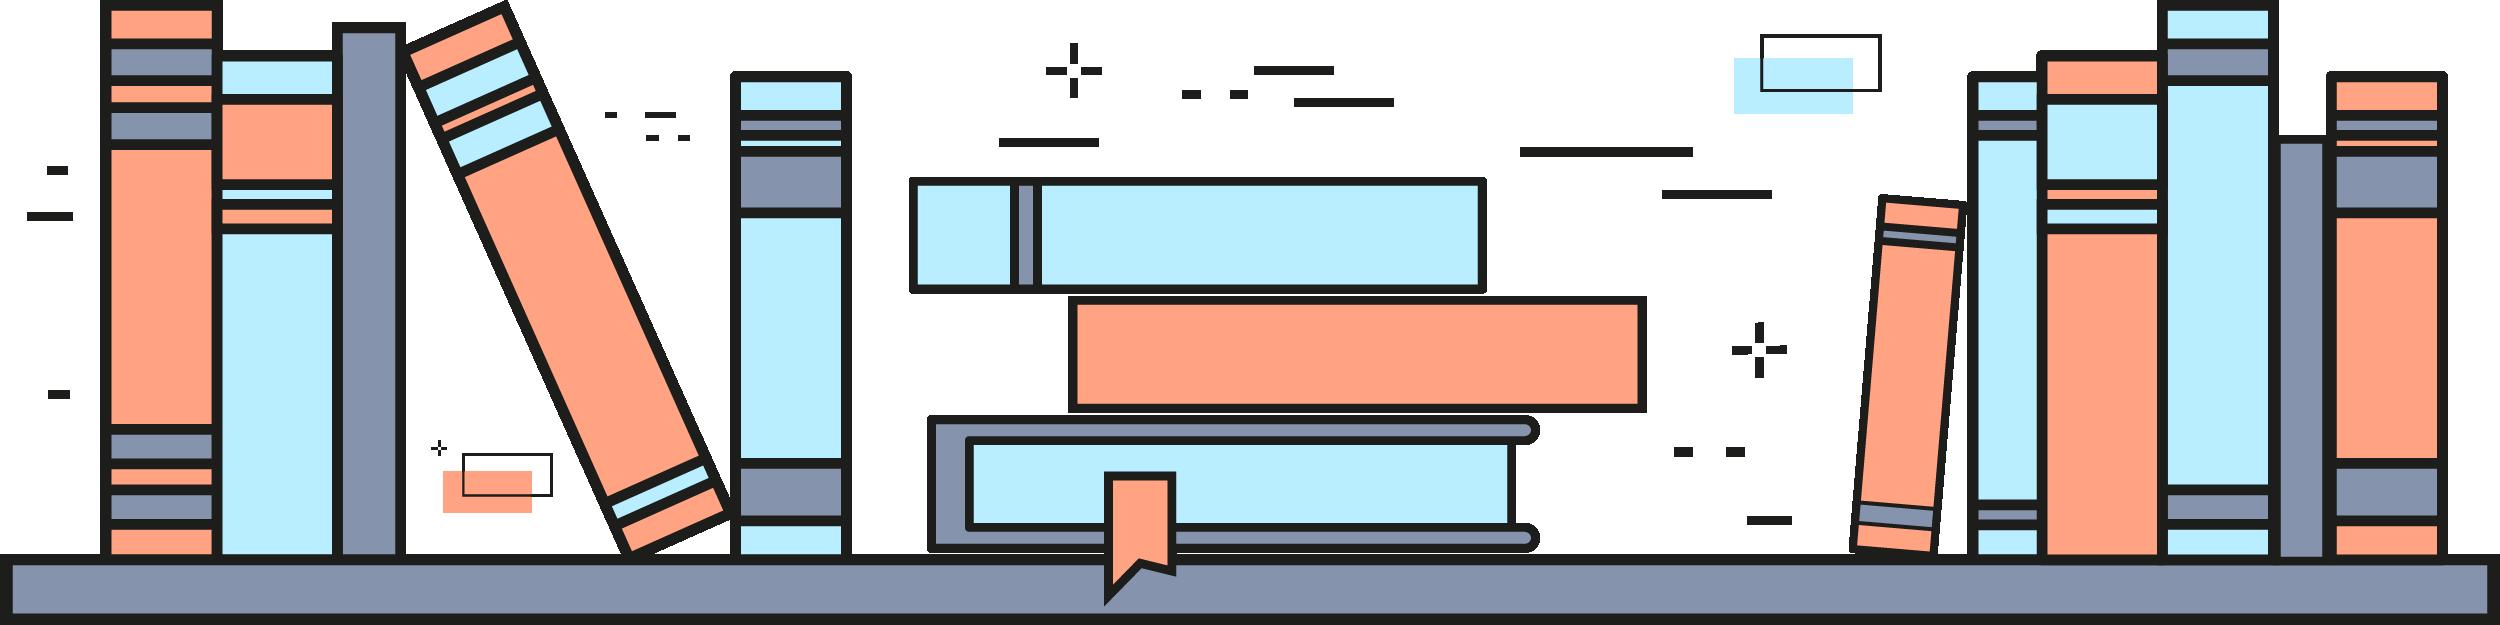 Bookshelf-01 Orig